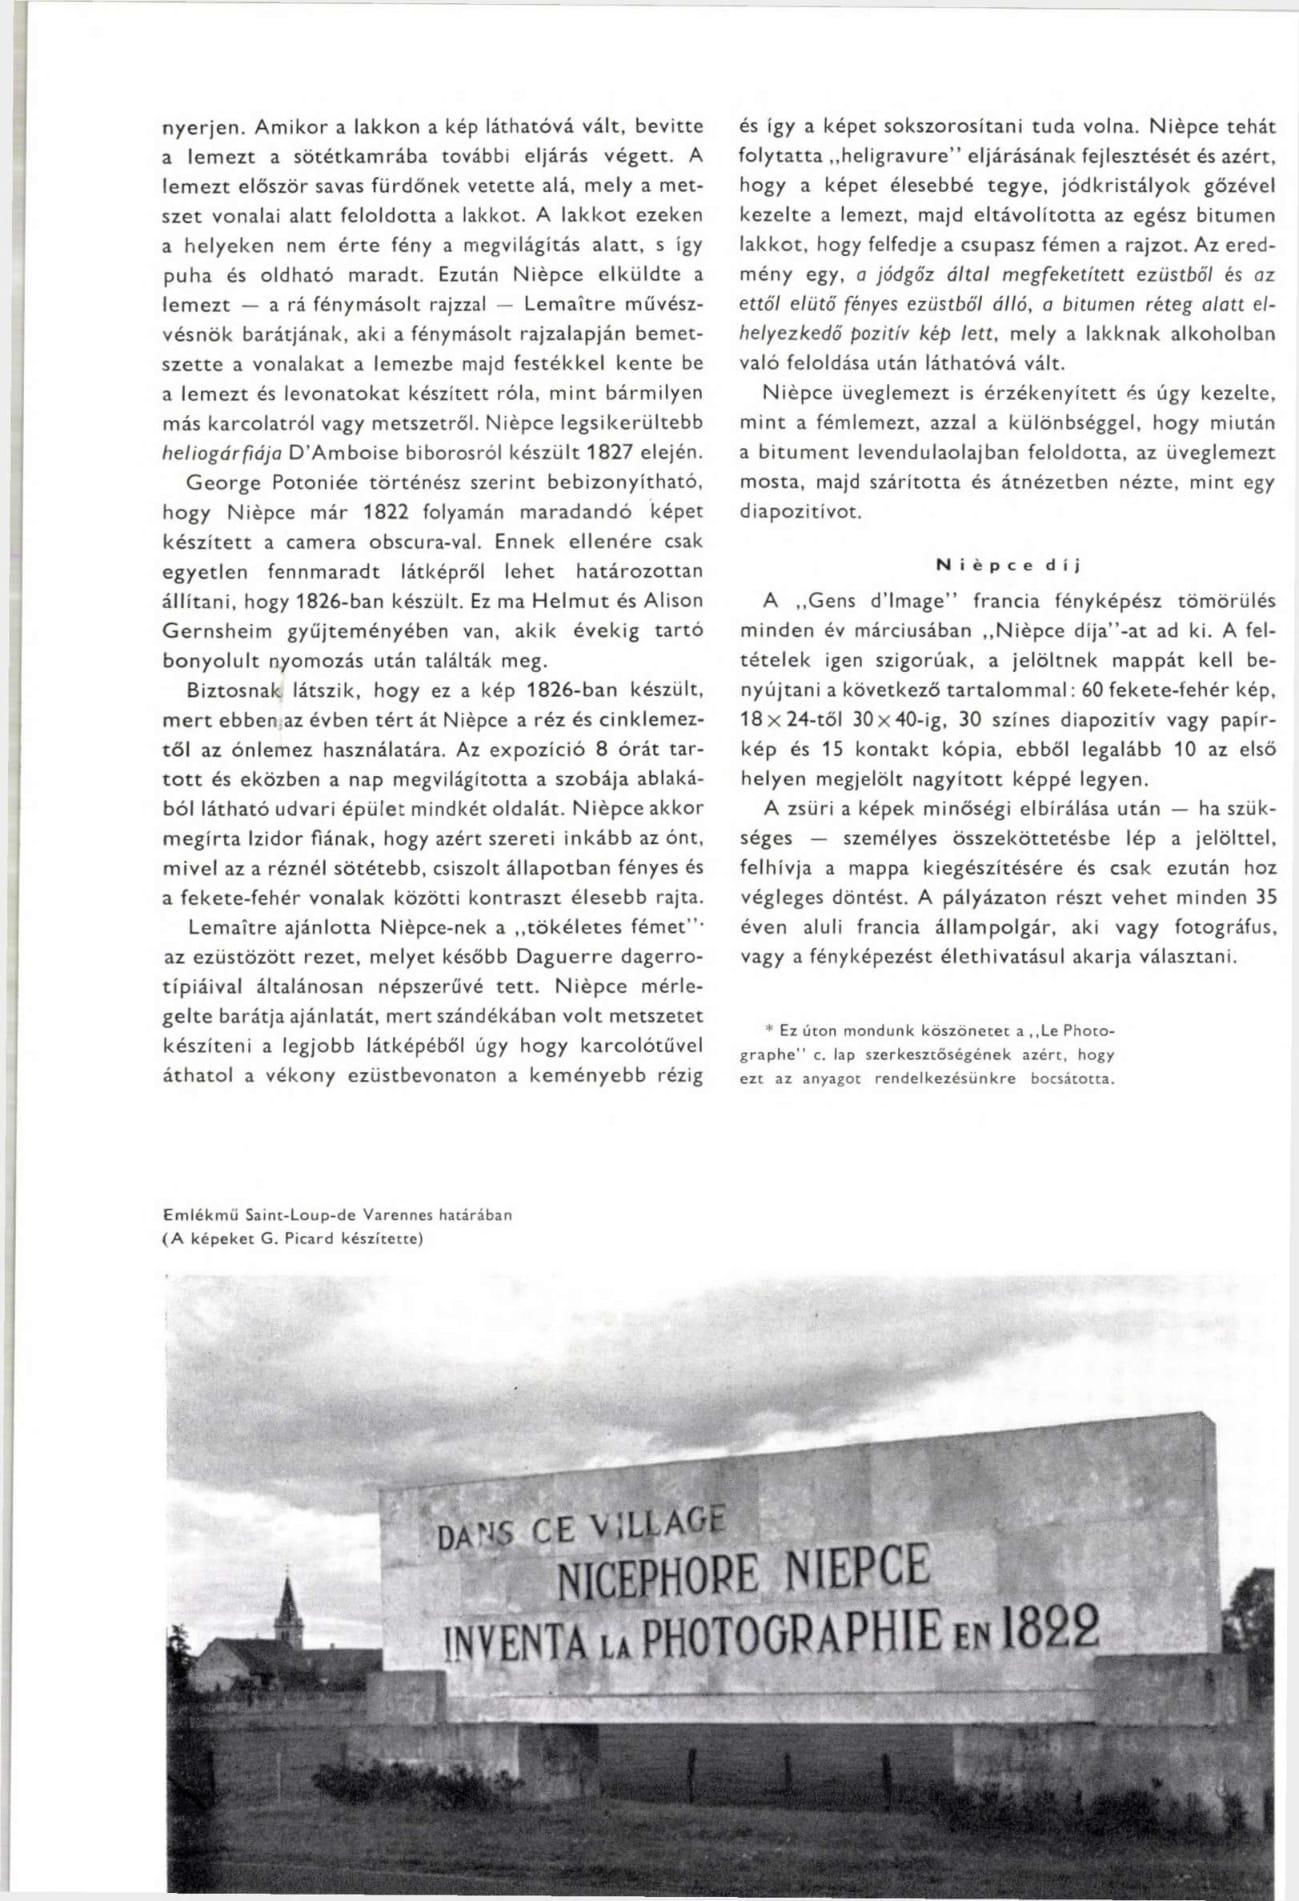 Foto, XIII. évfolyam, 1966. július<br />294. o.<br /><br />forrás: arcanum.hu